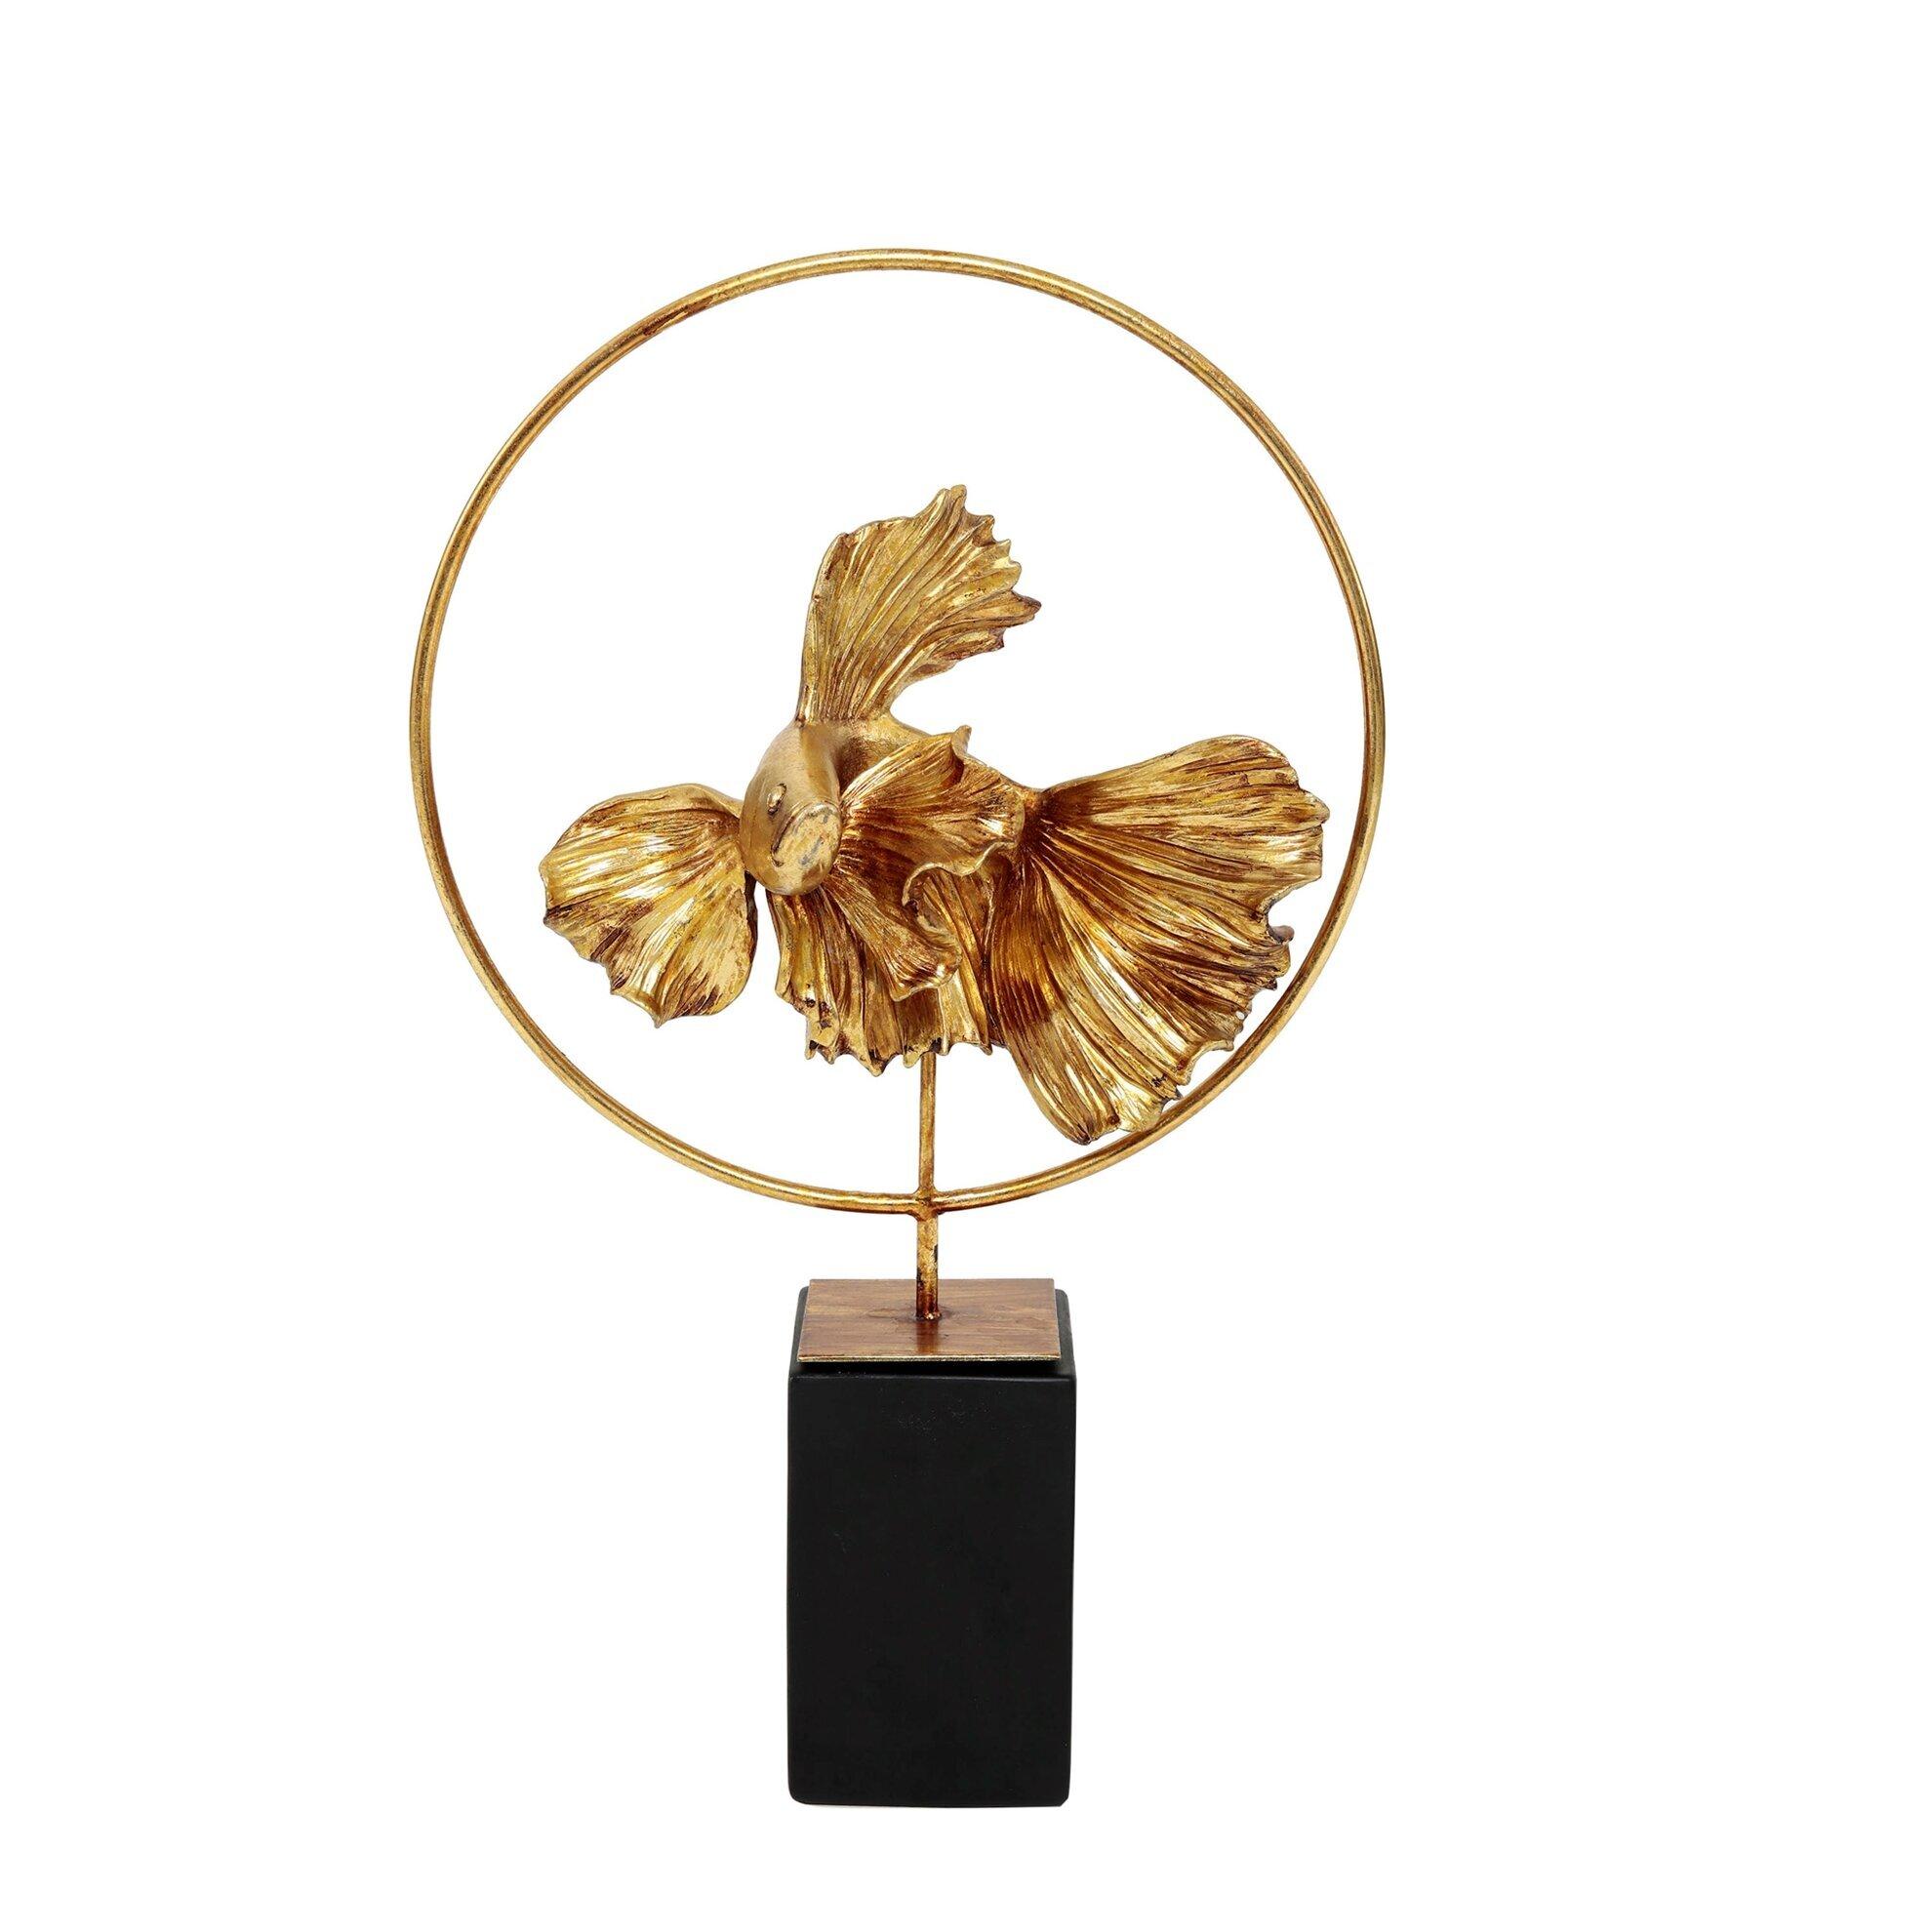 Decorative Object 36 X 16,5 X 59 cm